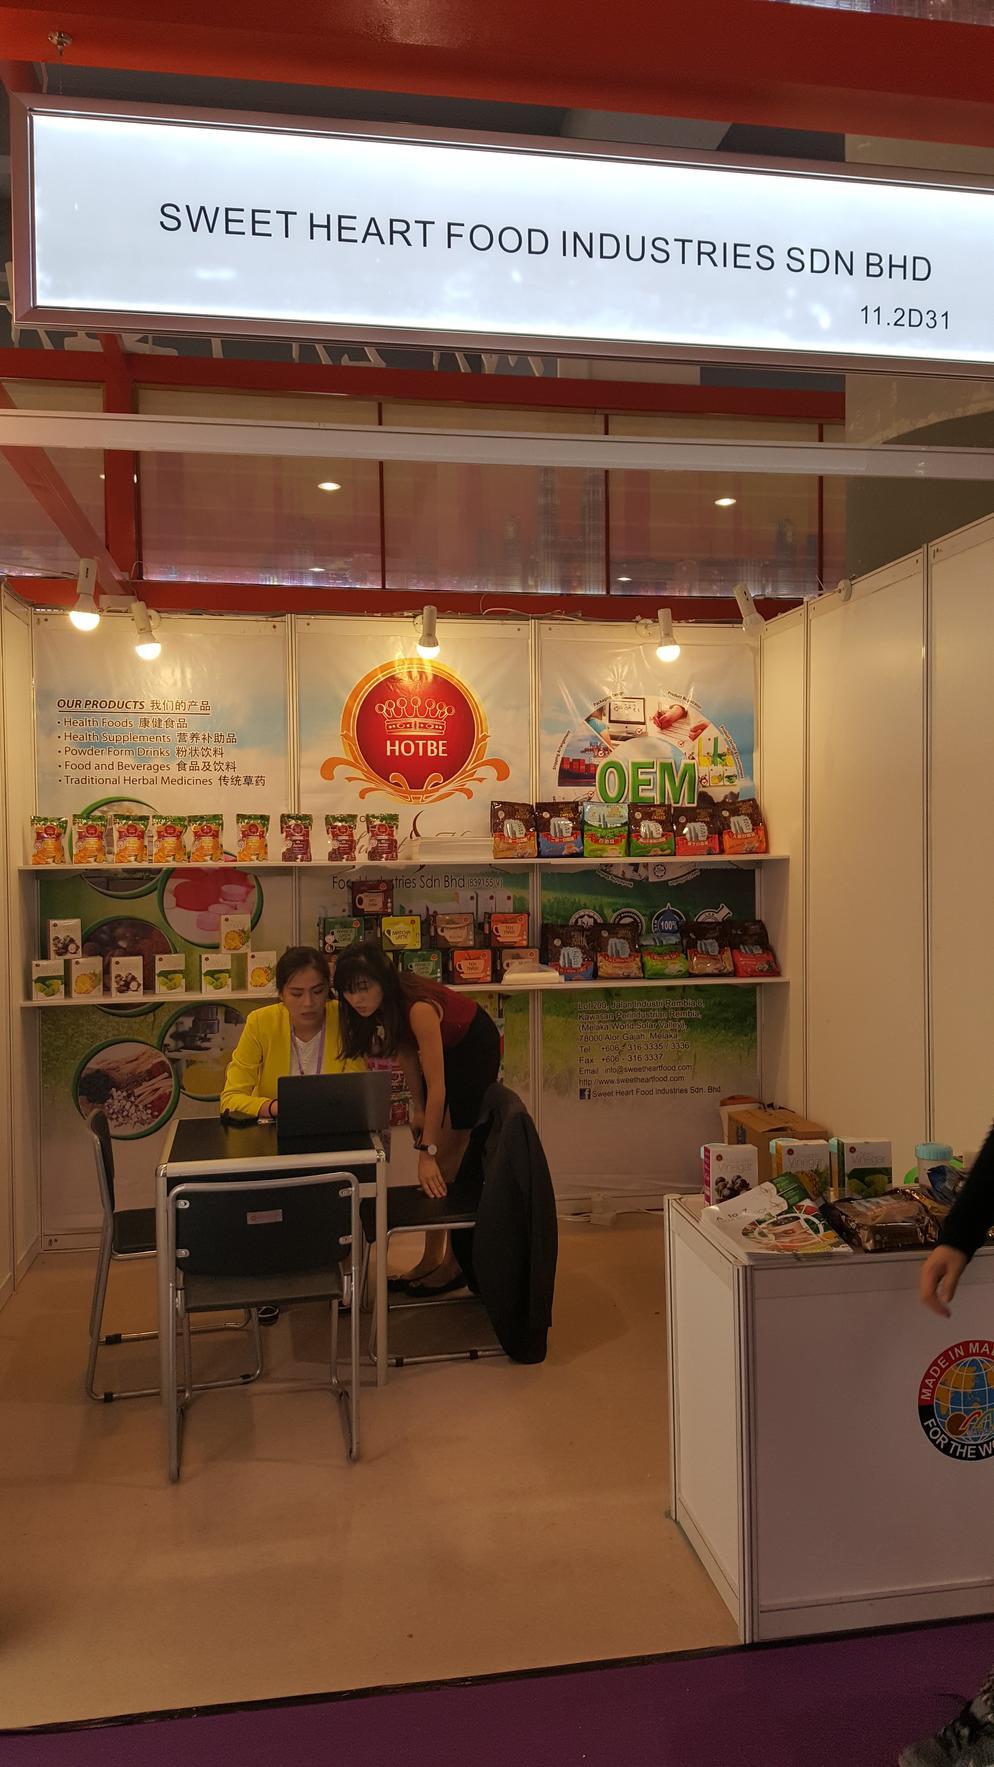 Sweet Heart Food Industries Sdn Bhd